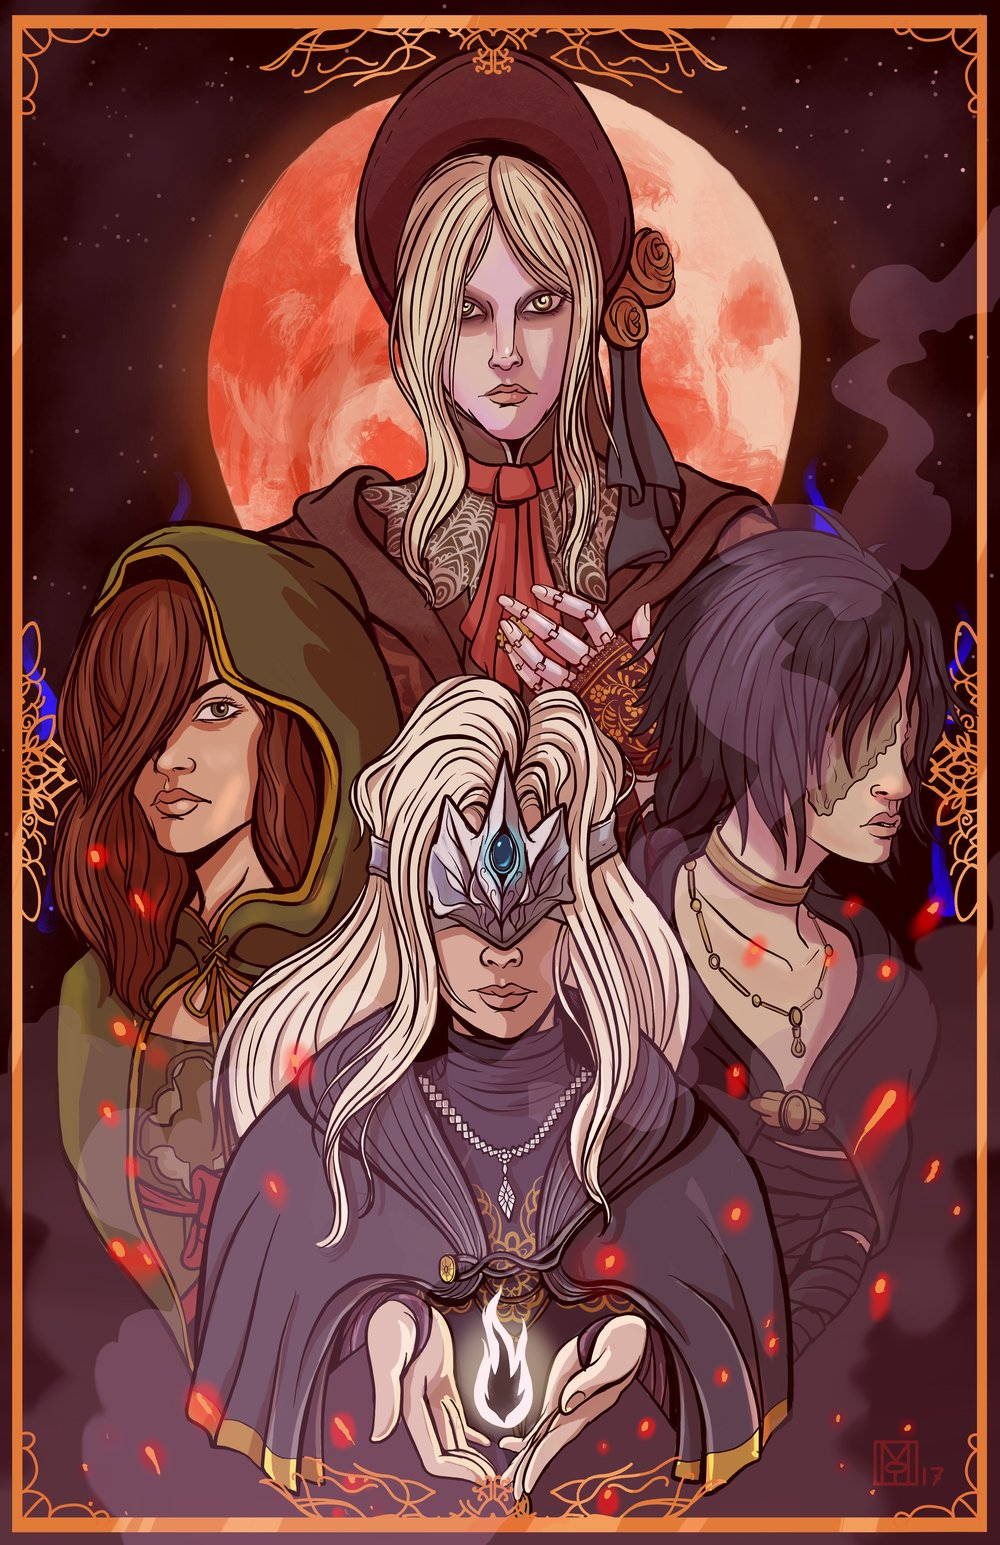 Soulsborne Maidens